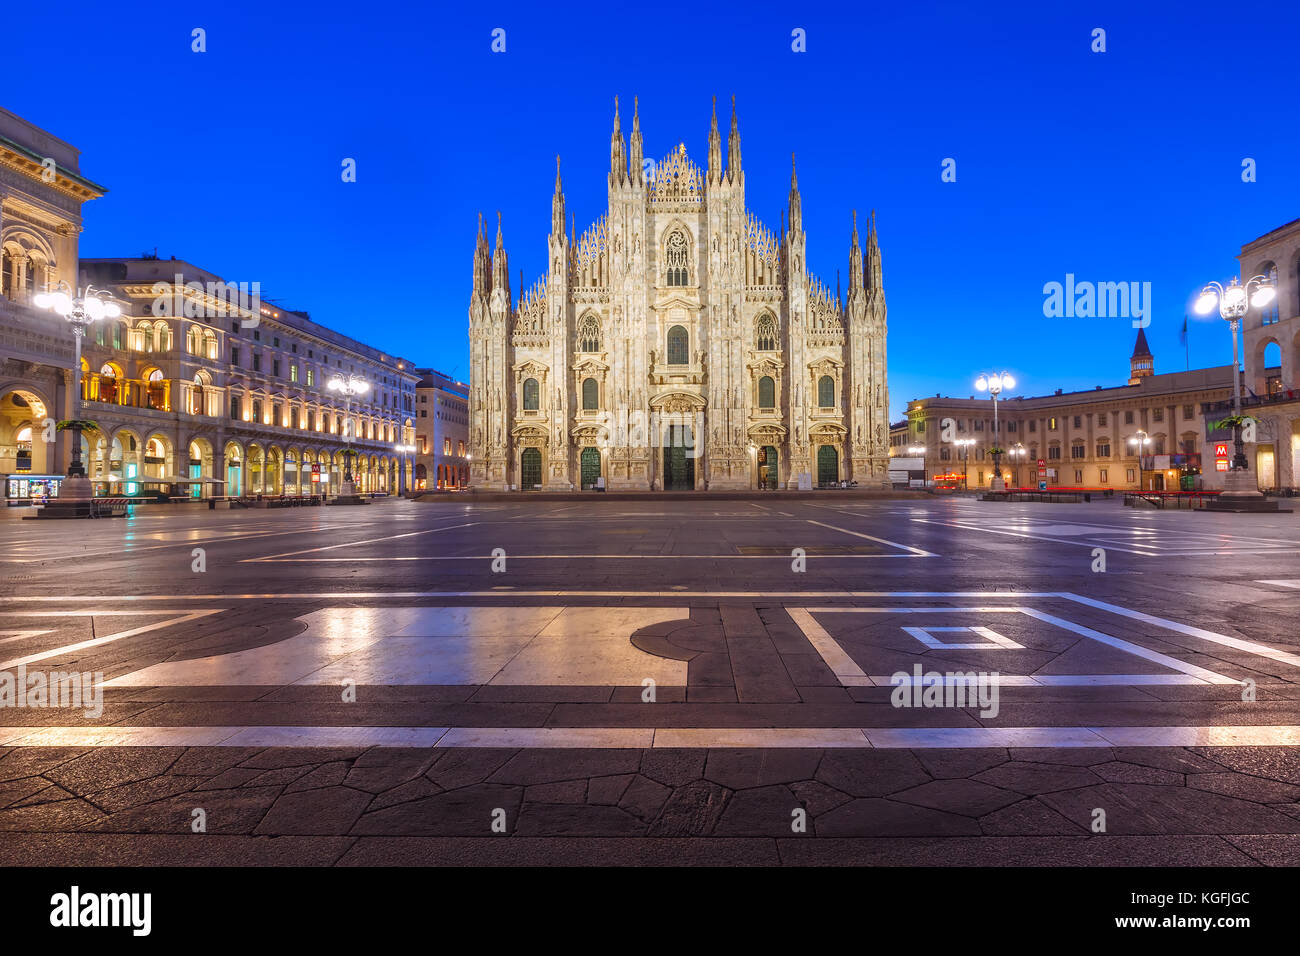 Night Piazza del Duomo in Milan, Italy - Stock Image